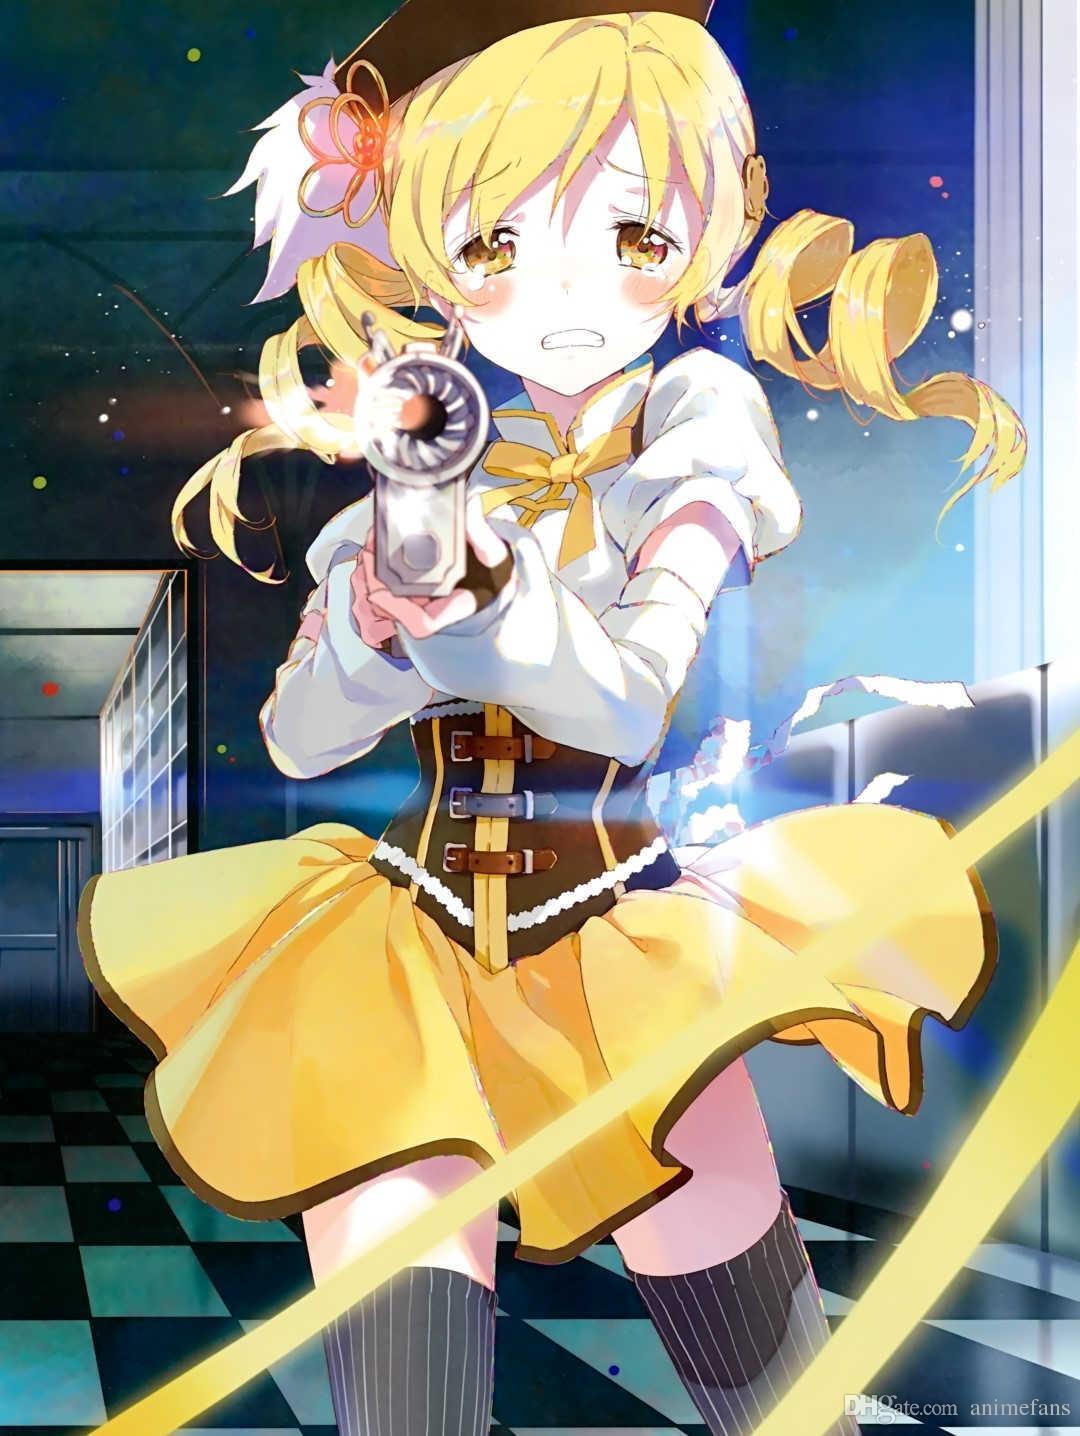 Hot Anime Puella Magi Madoka Magica Characters Akemi Homura Tomoe Mami Sheet Maho Shojo Madoka Magika Blanket Duvet Cover 1 10 Down Lap Throw Navy Blanket Throw From Animefans 62 32 Dhgate Com